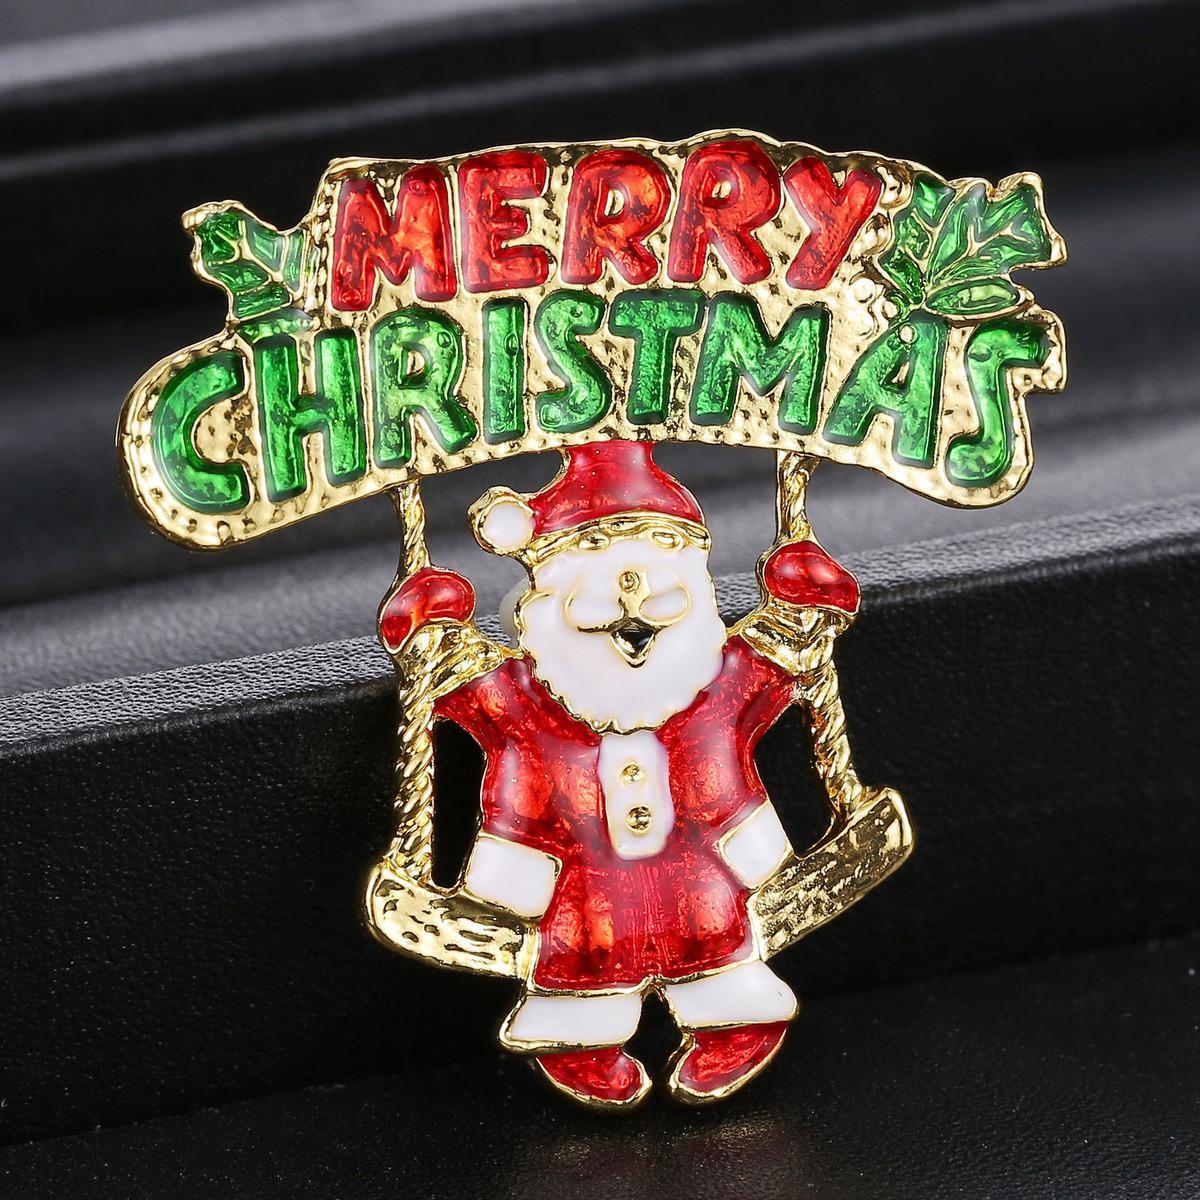 12 estilo esmalte boneco de neve santa tree broche pin presentes de natal jingle bell botas broches charme presente de natal de cristal